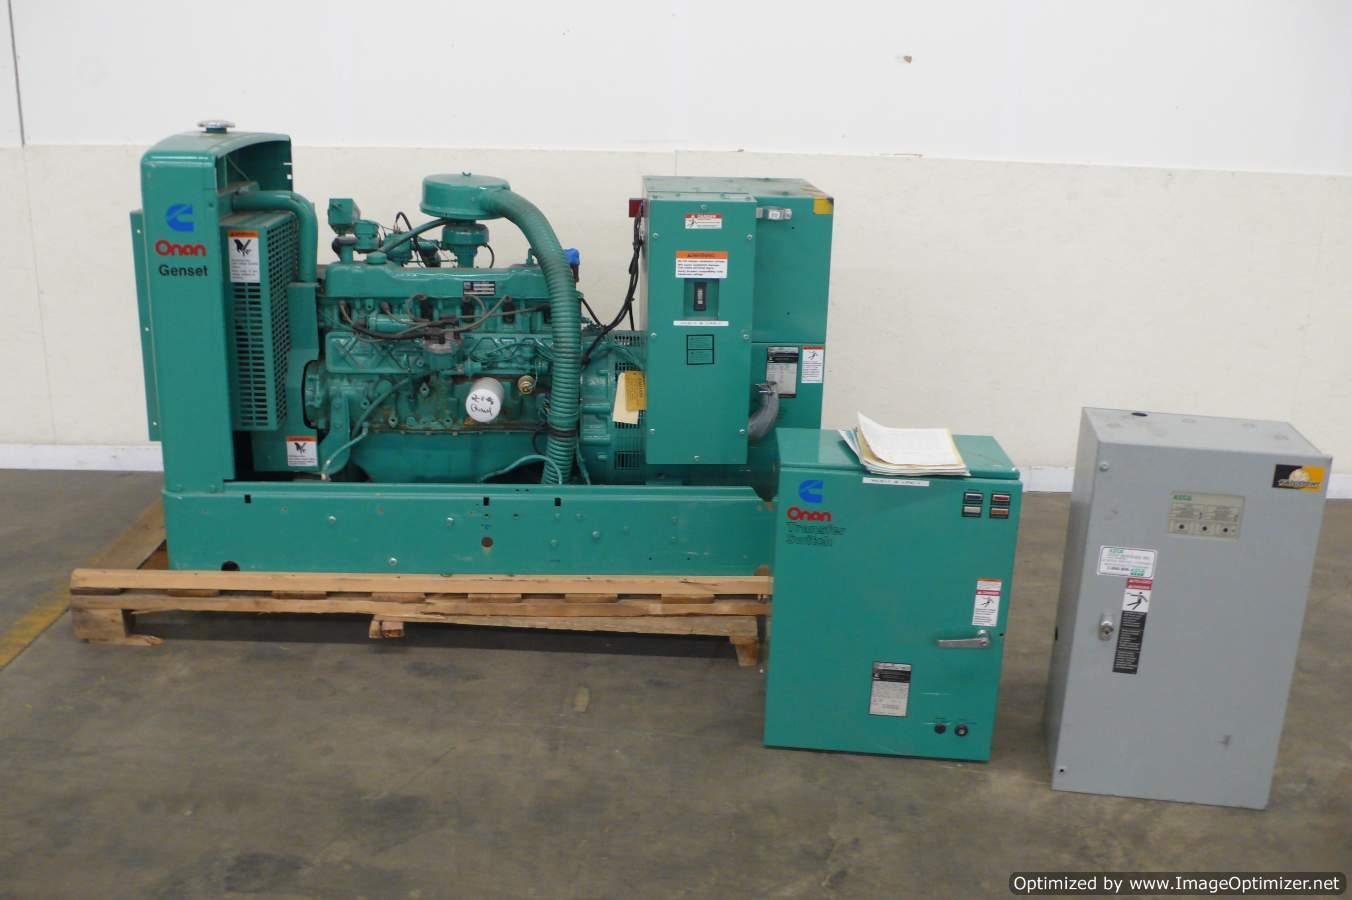 onan transfer switch diagram 2006 pontiac g6 headlight wiring 35kw natural gas propane 3 ph or 1 generator 133